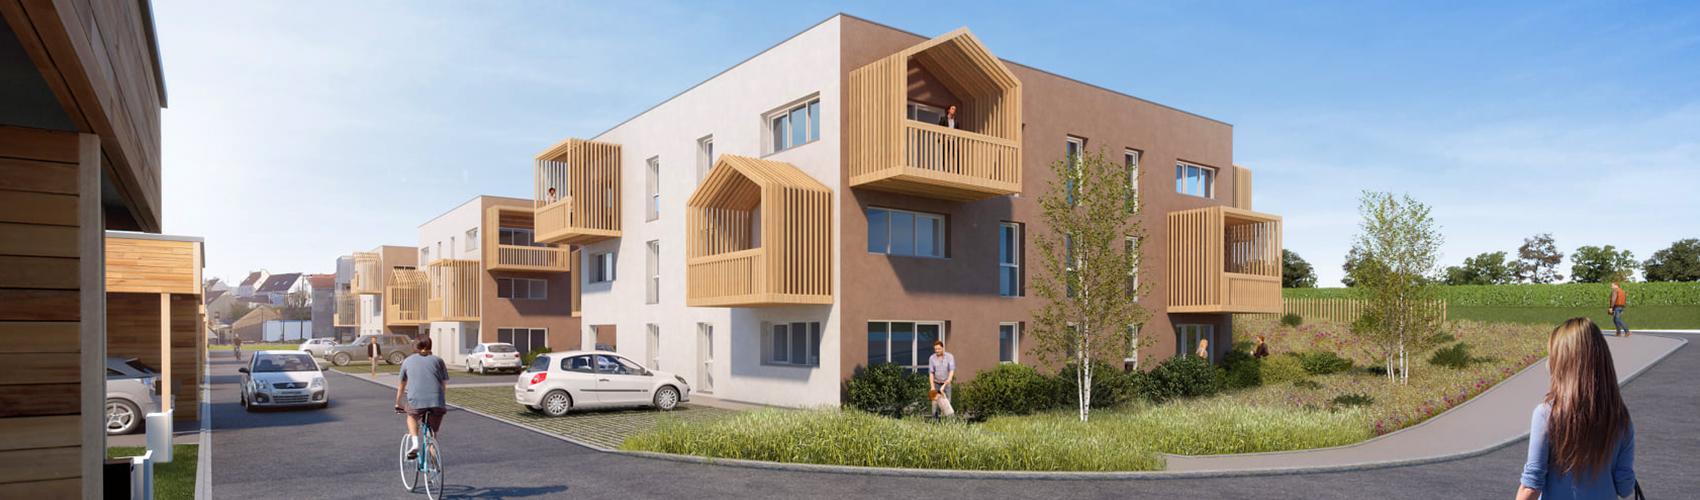 Photo du programme immobilier neuf HDF-2426 à RINXENT